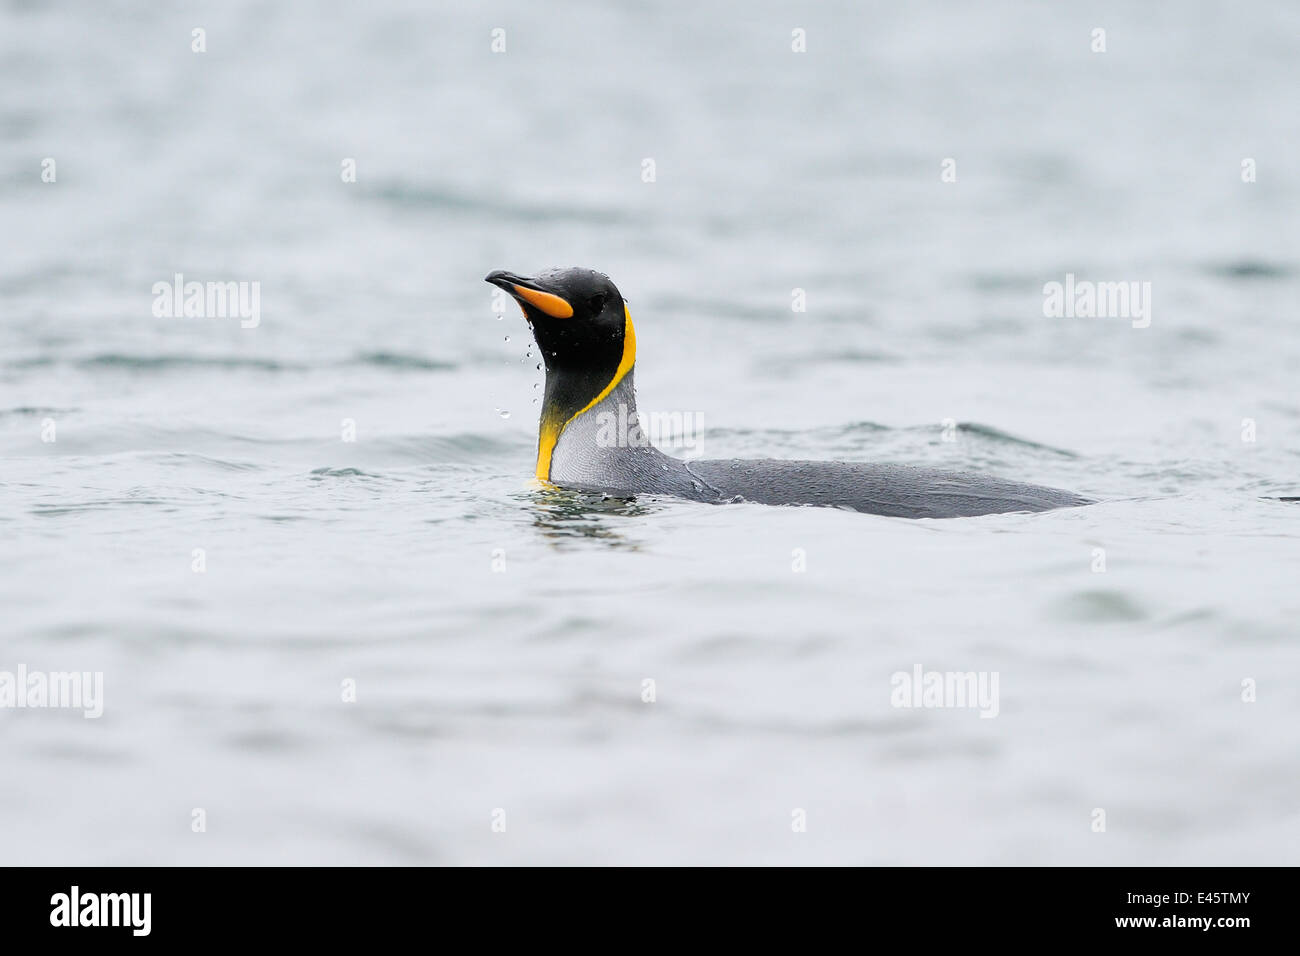 King Penguin (Aptenodytes patagonicus) swimming in water at Macquarie Island, sub Antarctic waters of Australia. - Stock Image